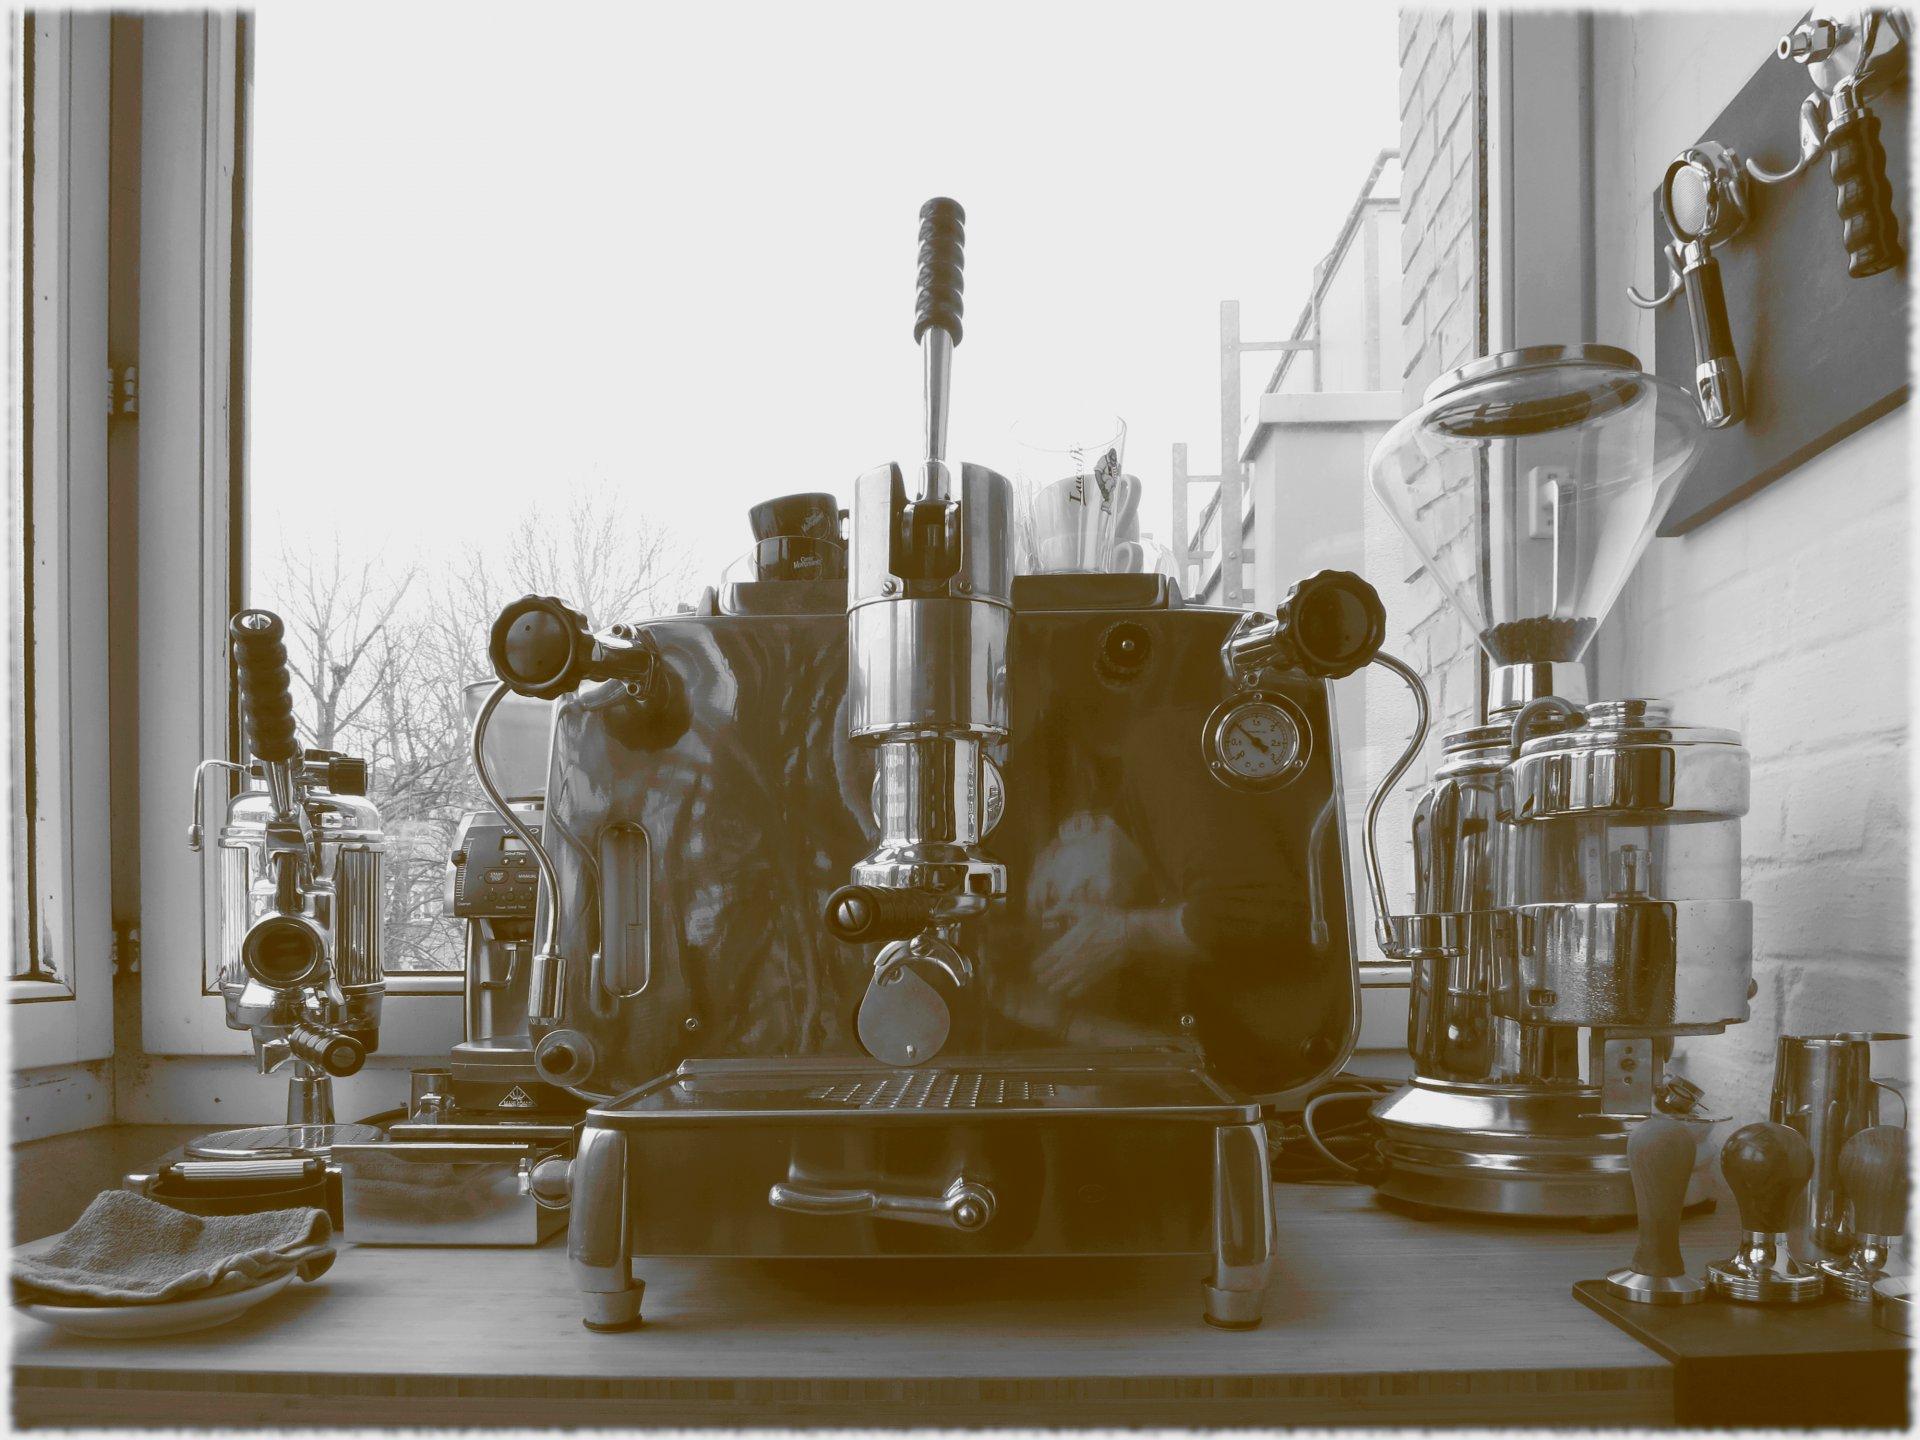 kaffeeecke 1964.jpg